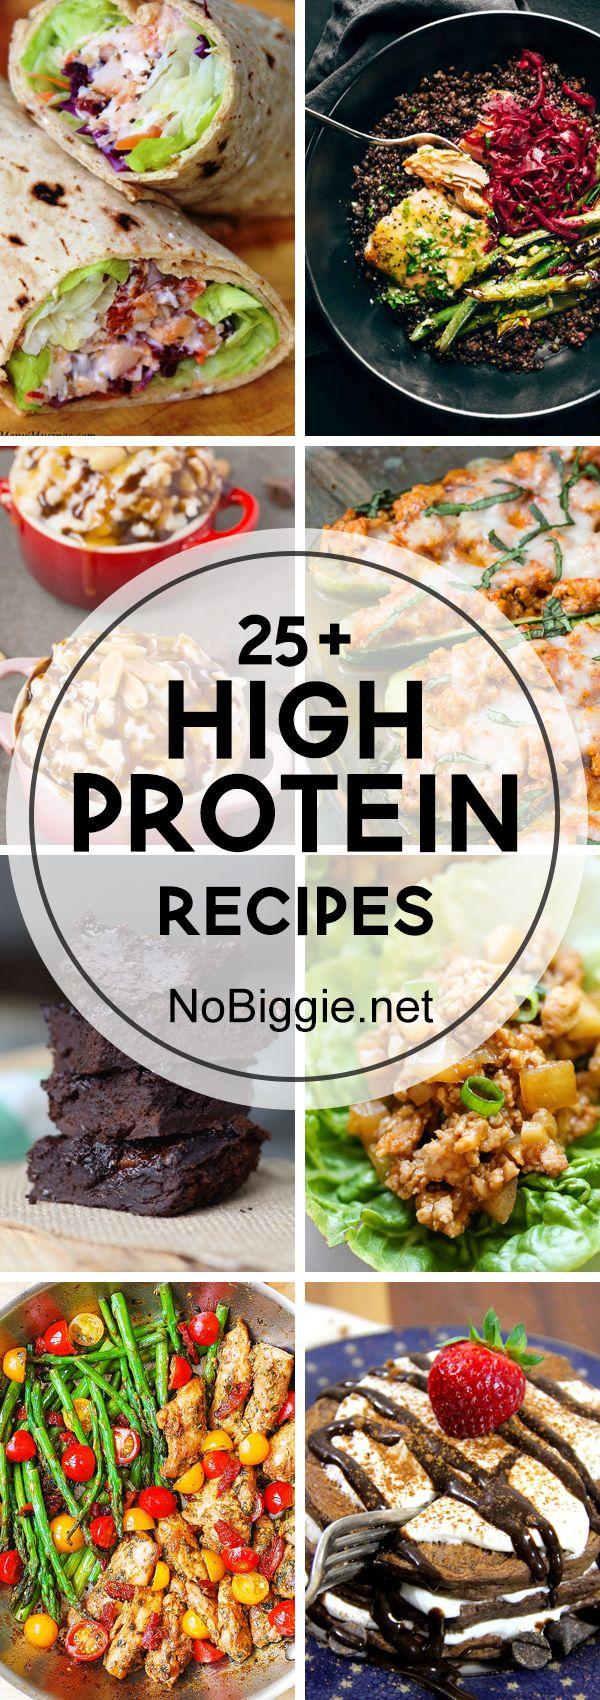 25+ High Protein Recipe   NoBiggie.net